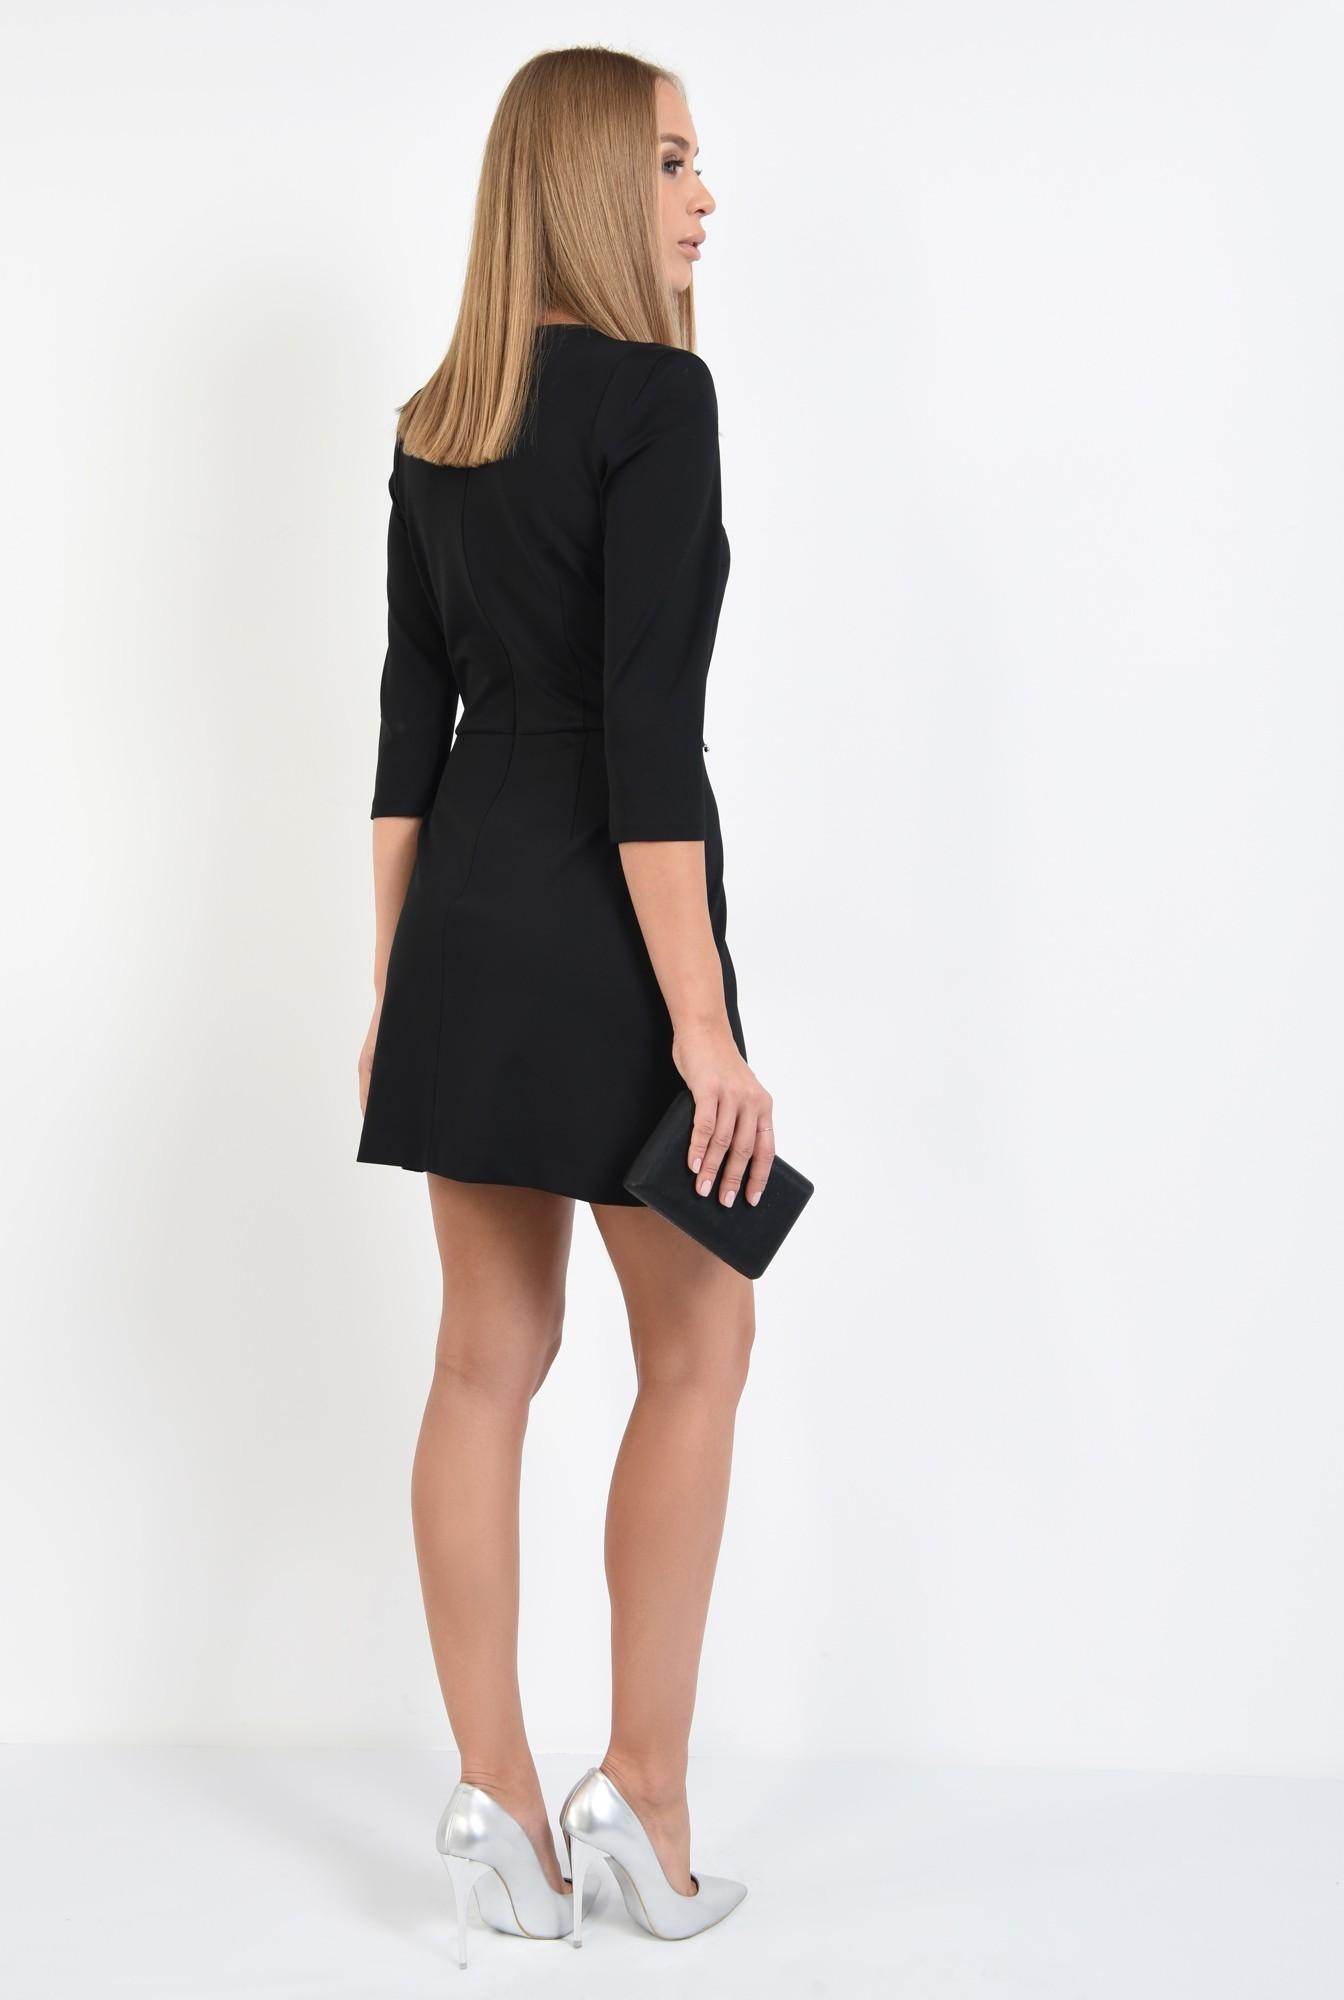 1 - 360 - rochie mini, neagra, maneci 3/4, croi usor evazat